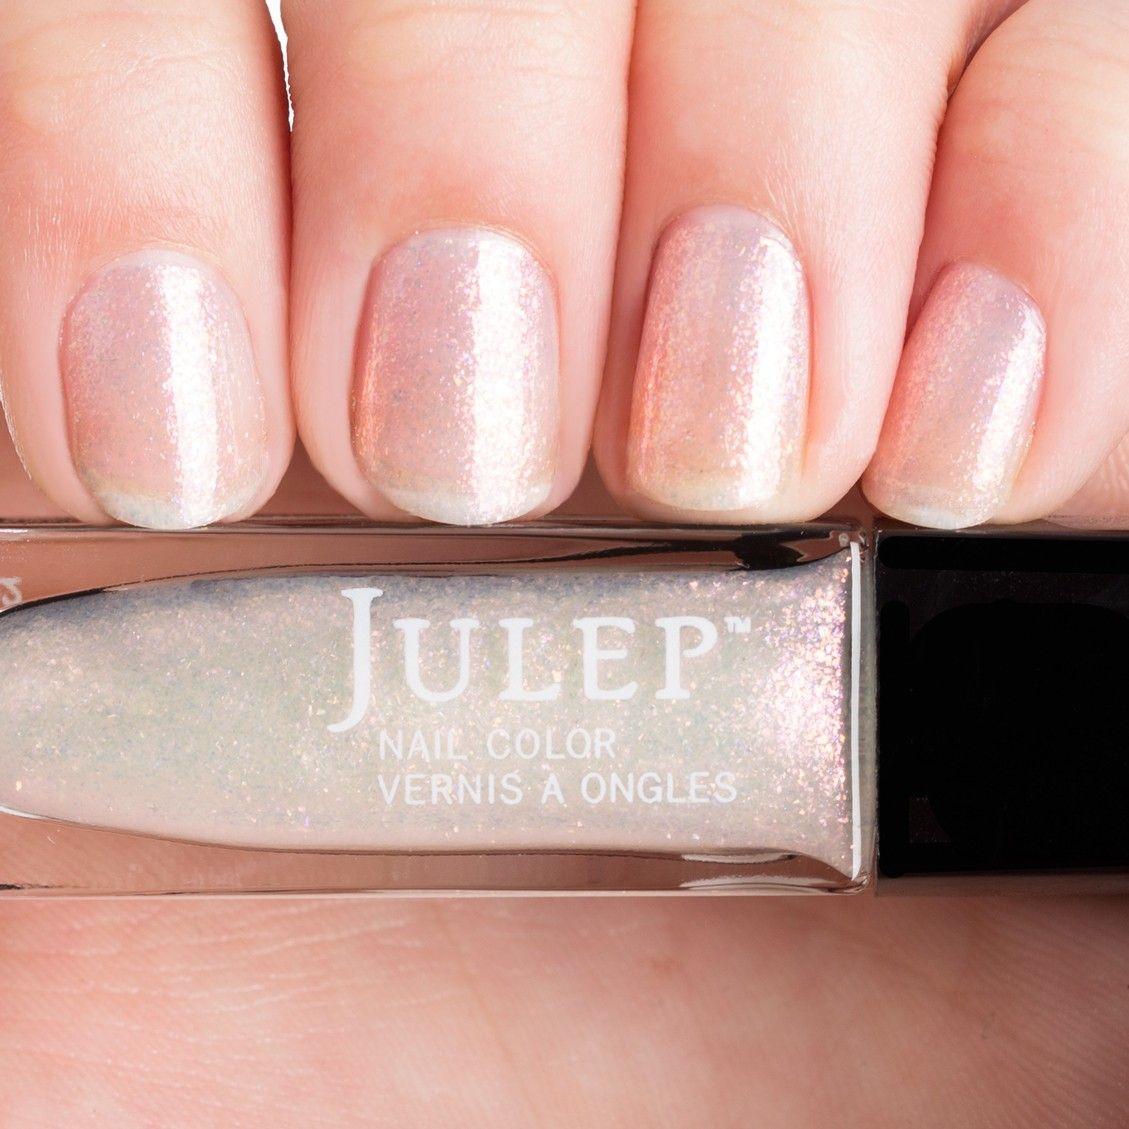 Julep Katerina: Pixie mutidimensional iridescent top coat ...